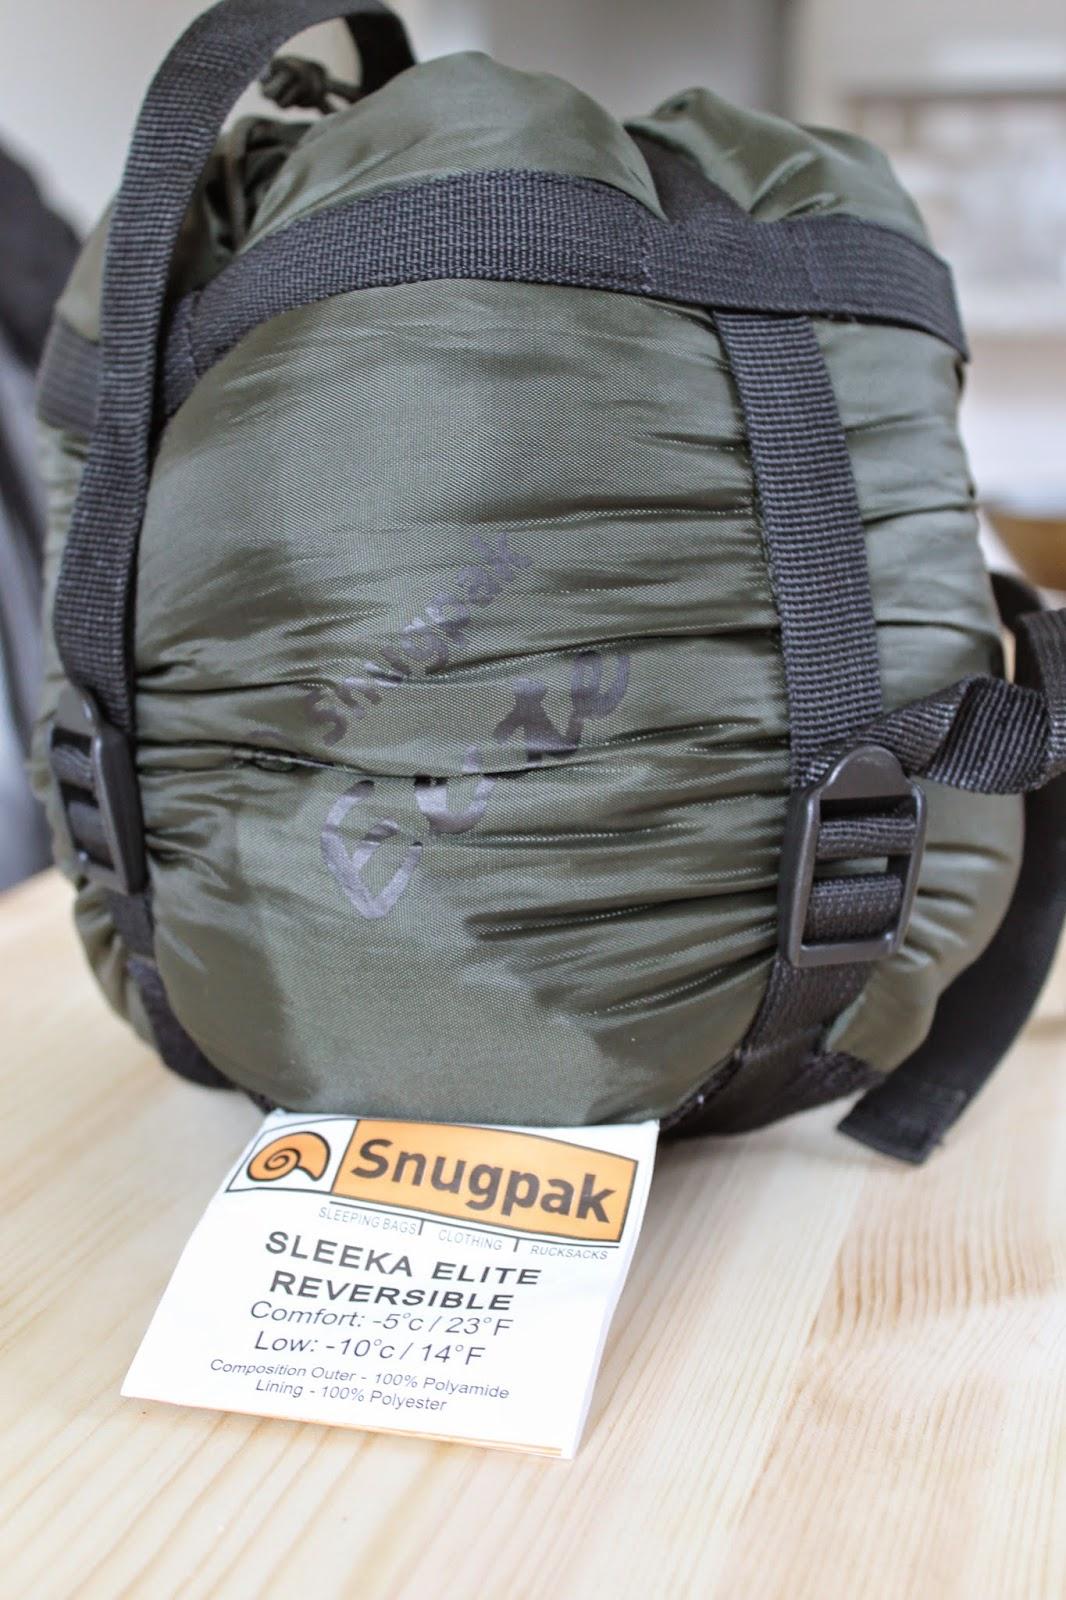 :@Where to buy Snugpak Sleeka Elite Reversible Jacket ...